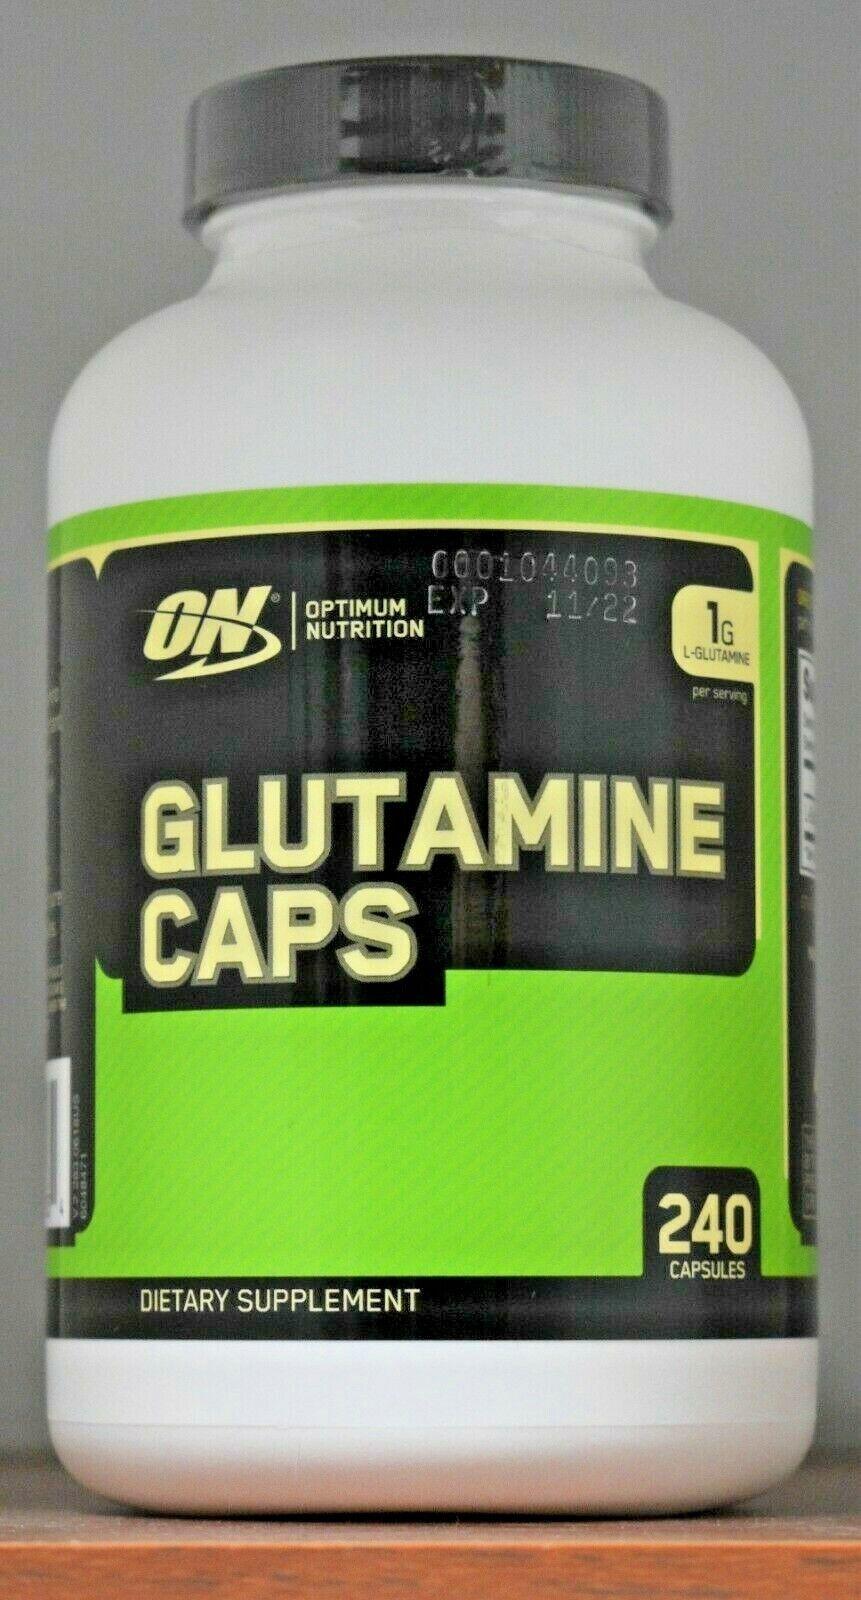 Optimum Nutrition Glutamine caps 1G L-Glutamine 1000mg ON 24